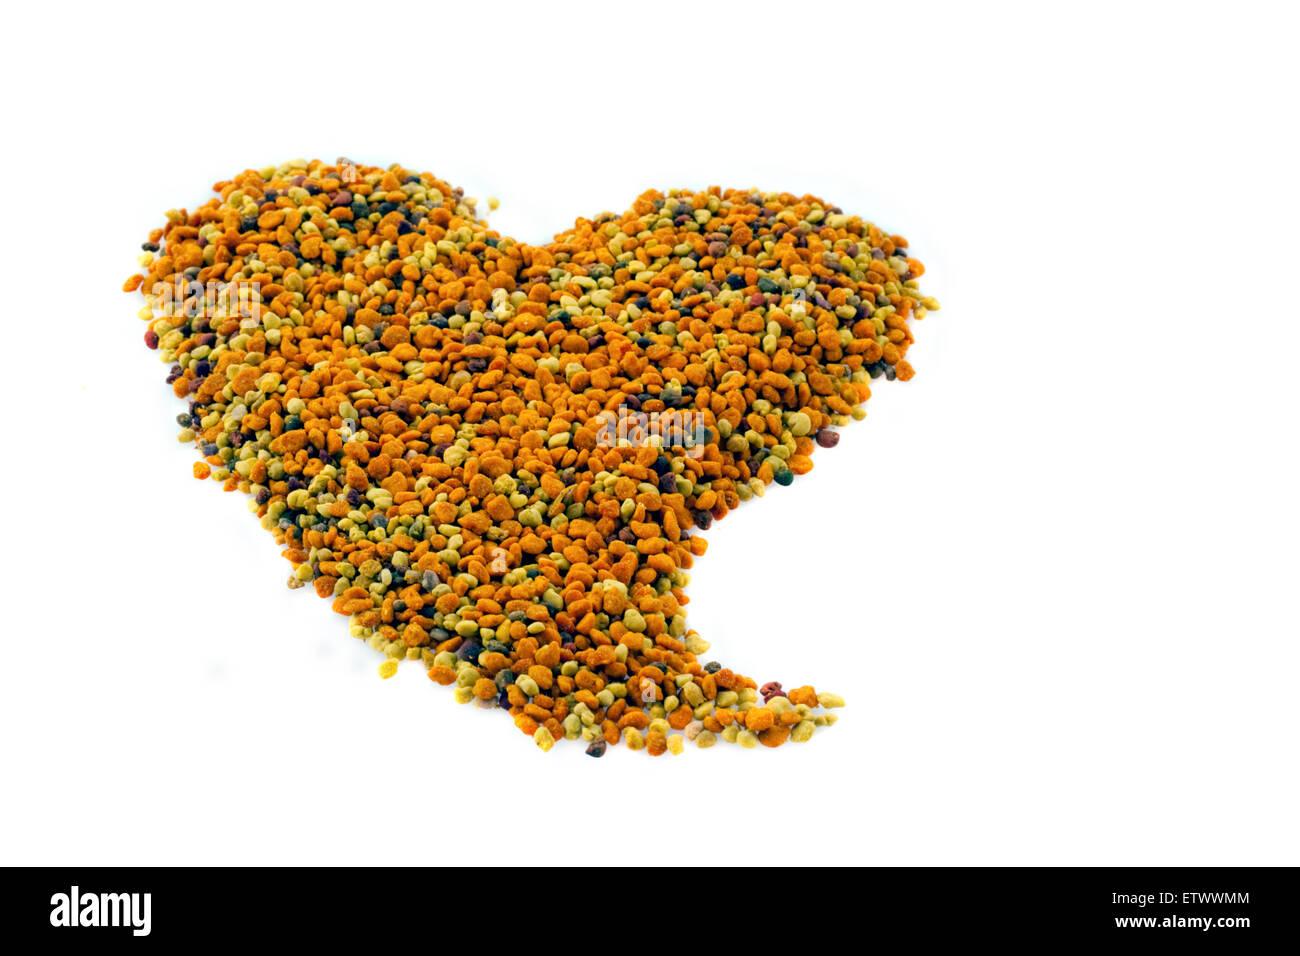 heart shaped raw dried apis honey bee pollen grains mix vitamins natural medicine macro - Stock Image